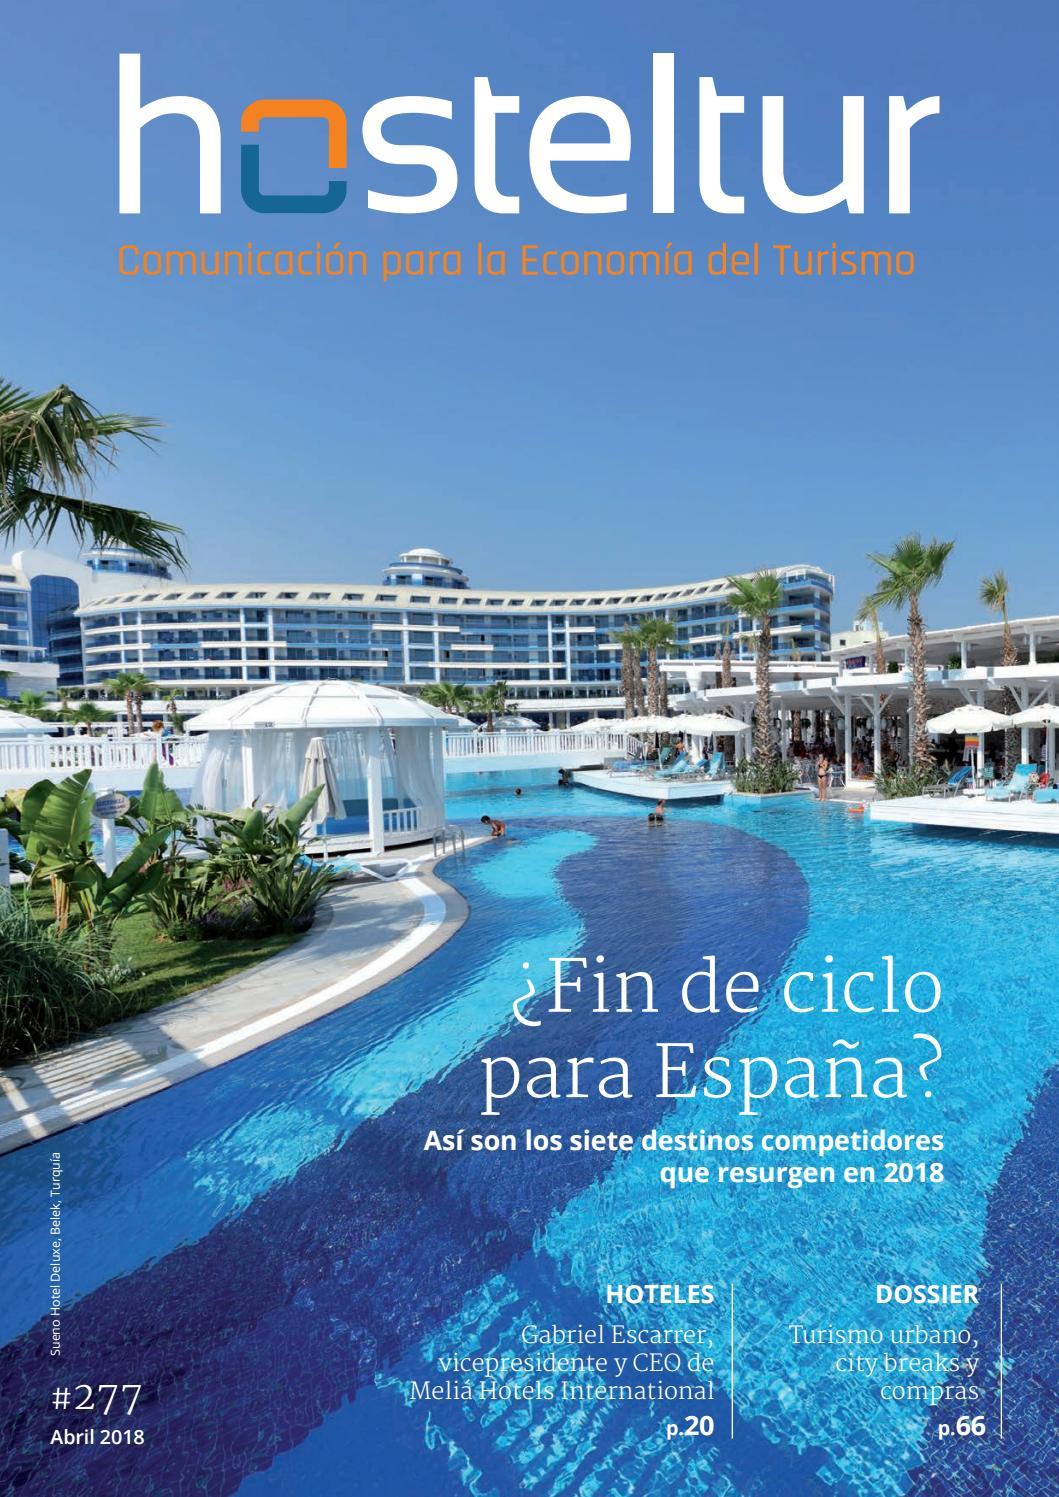 Hosteltur 277 - ¿Fin de ciclo para España? by Hosteltur-2018 - issuu